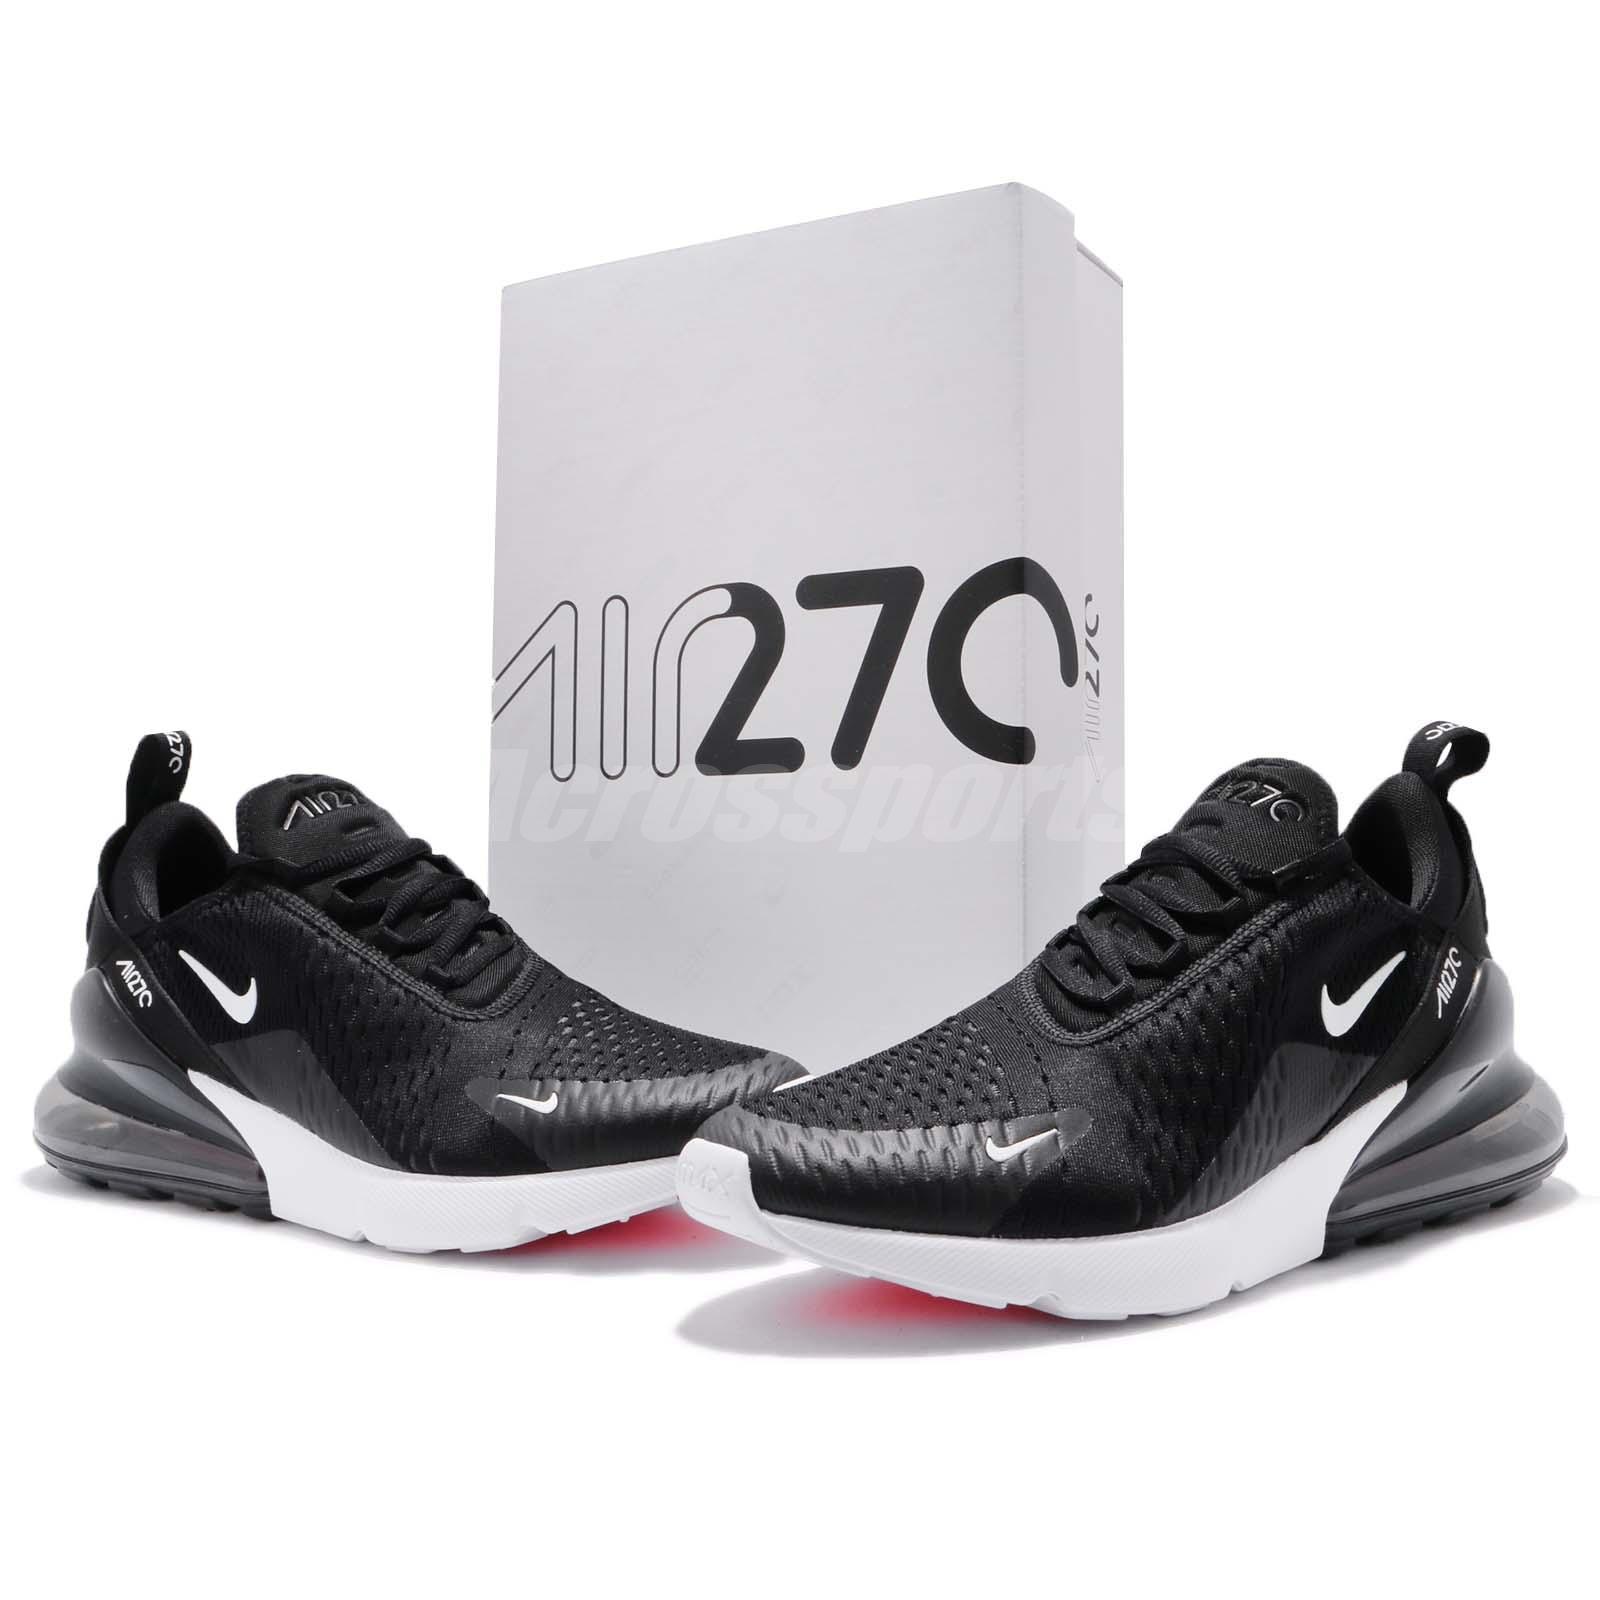 Nike Air Max 270 Black White Men